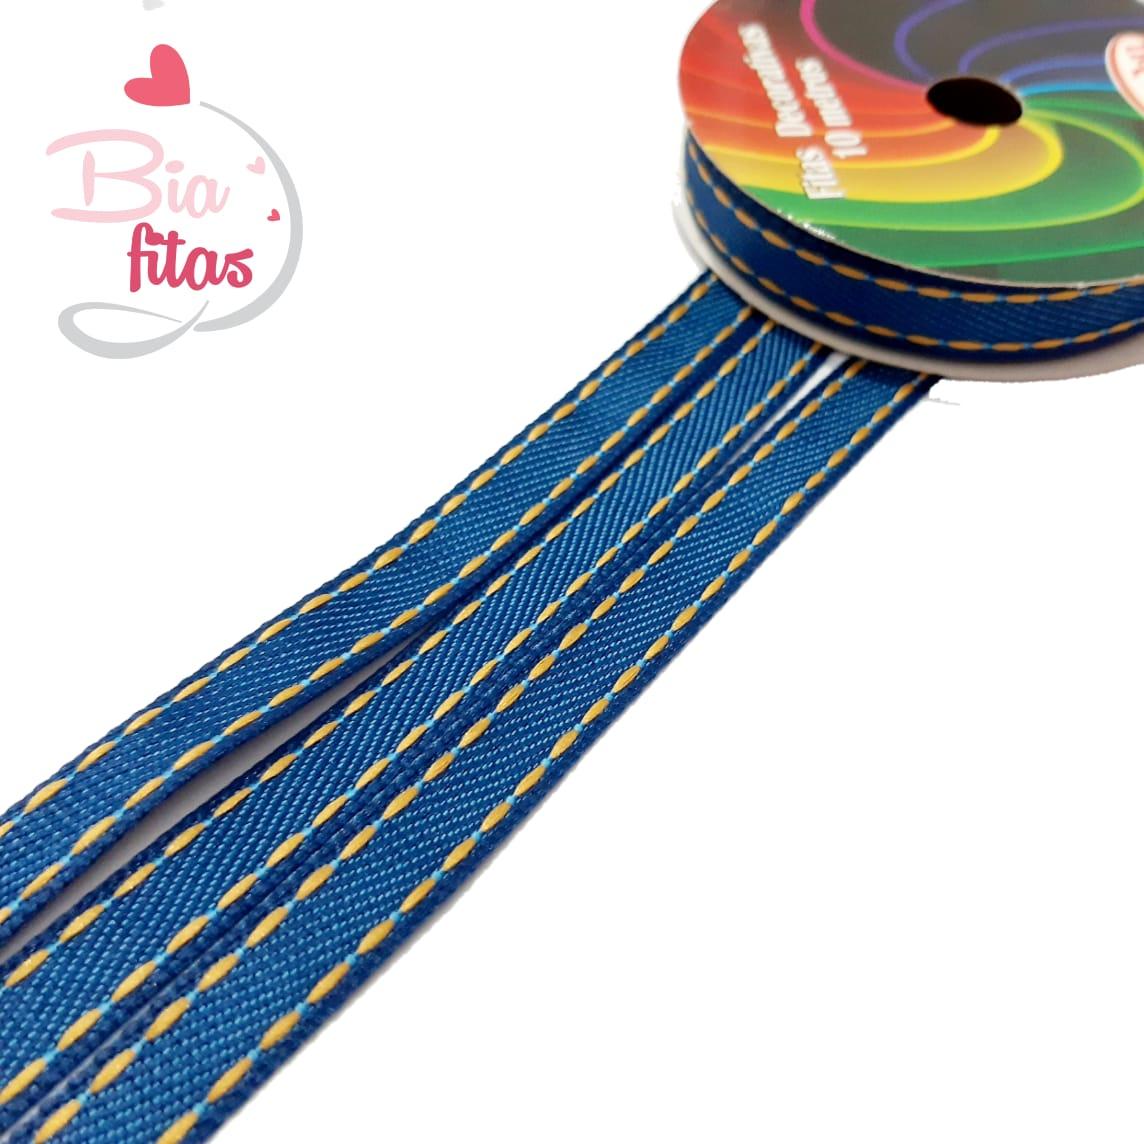 Fita de Jeans Pesponto Sinimbú 10 - 01 - 5 metros